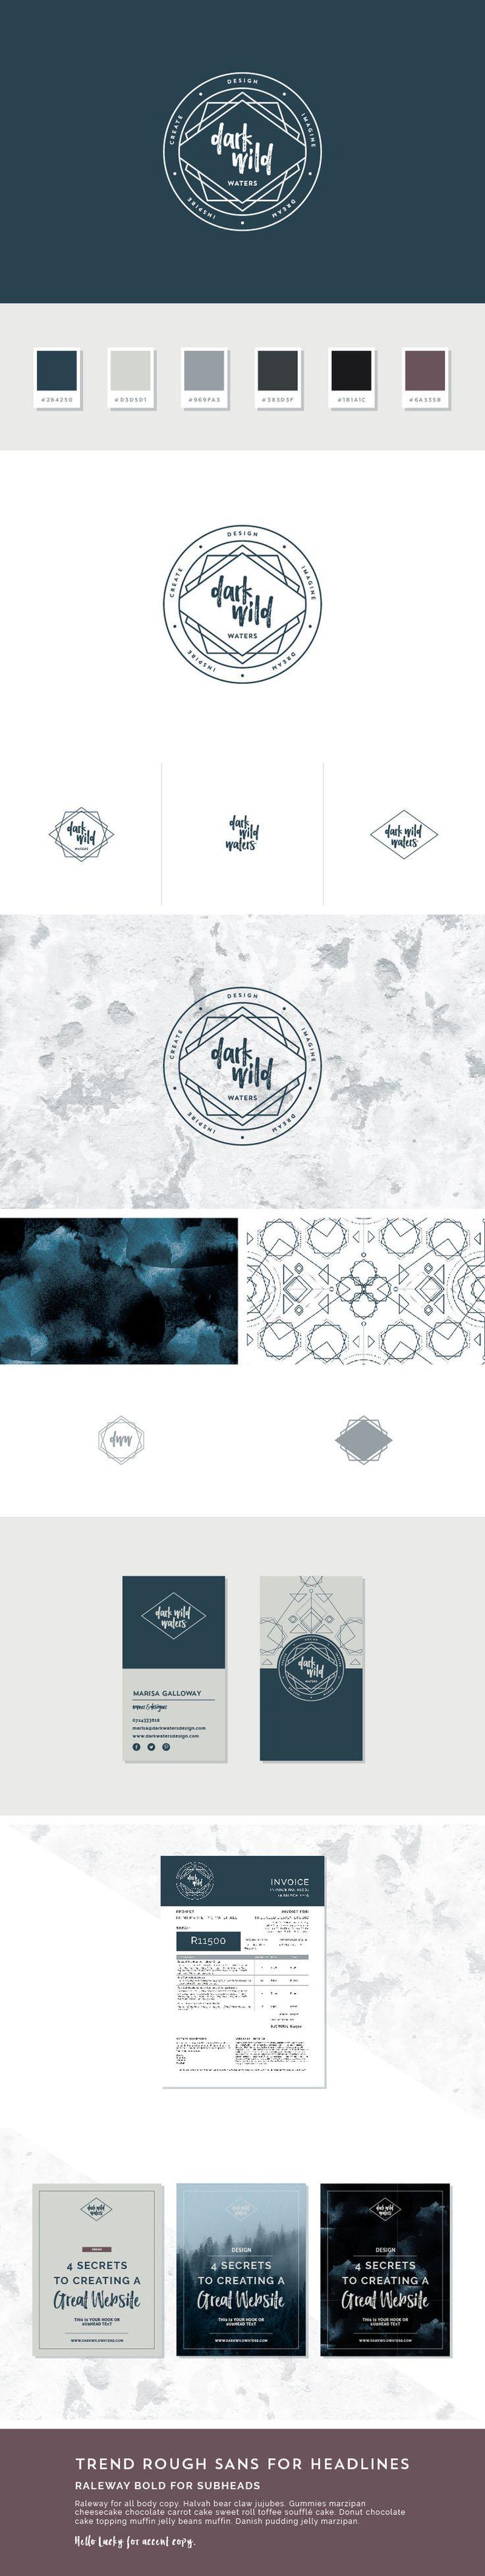 Dark Wild Water brand styling and design by Freckled Design Studio